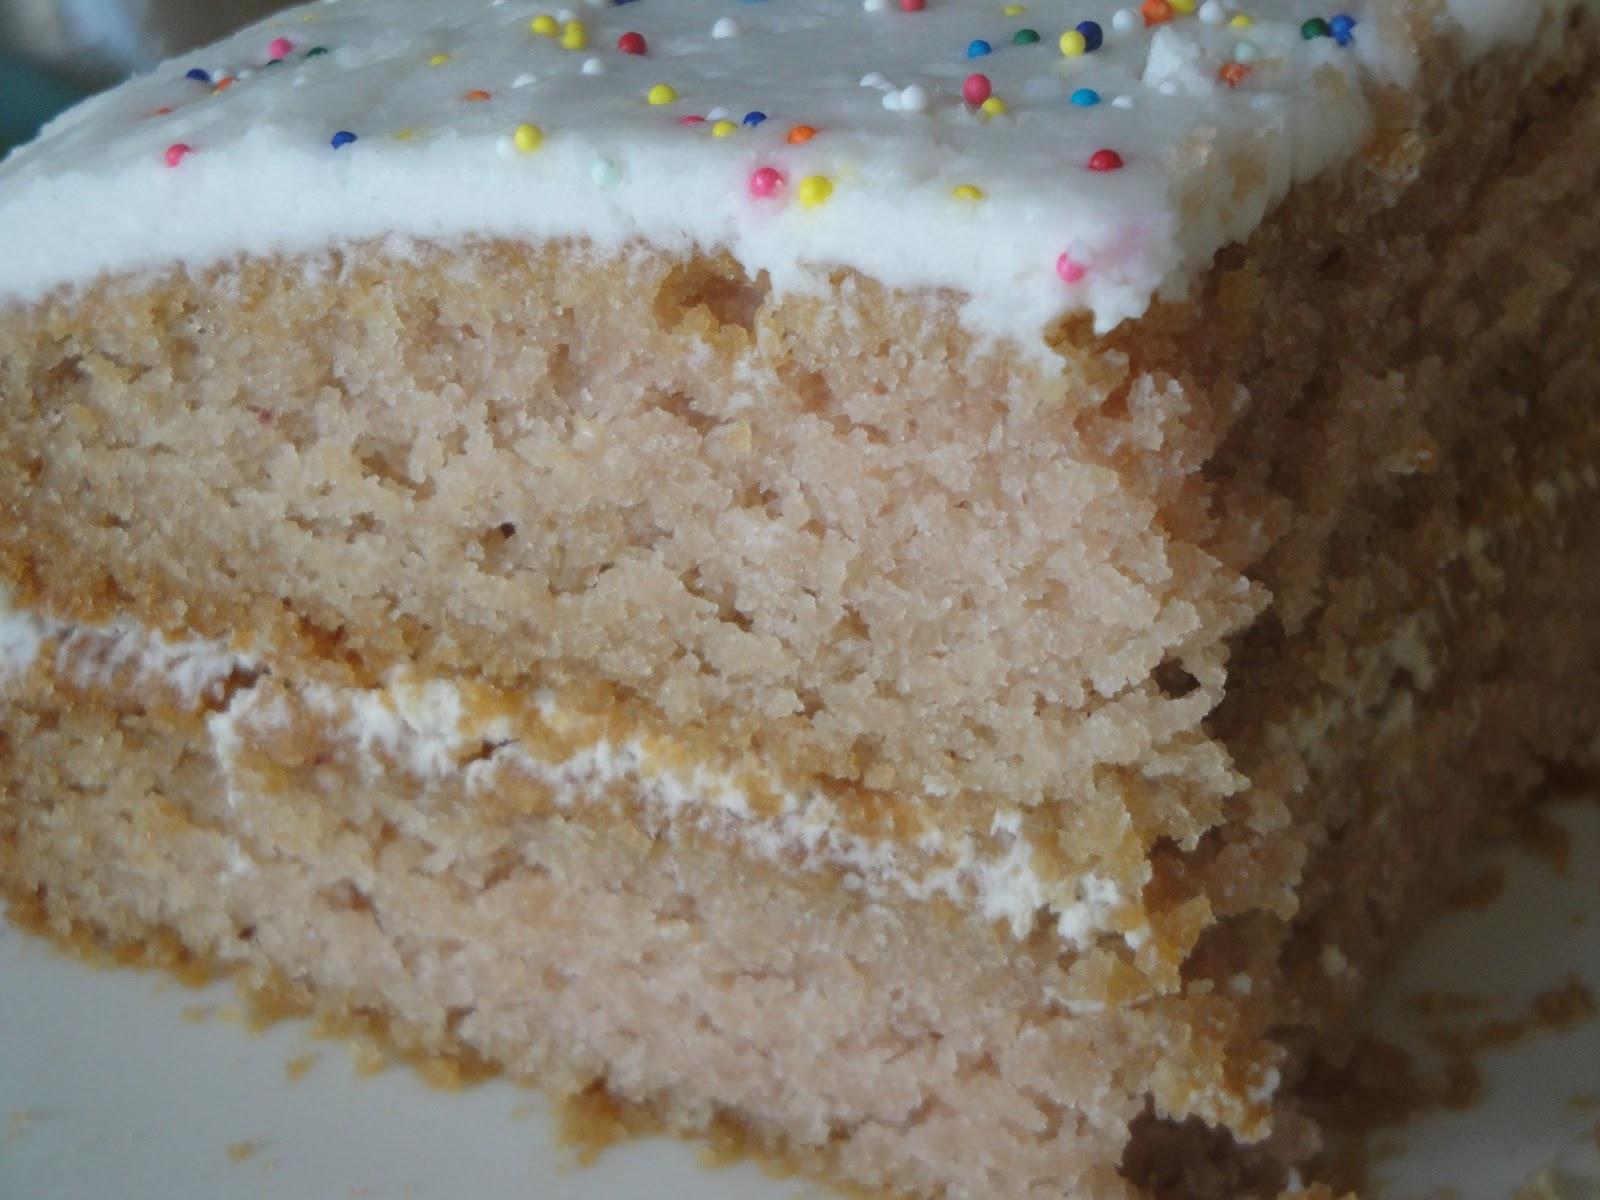 How To Make Gluten Free Chocolate Cake Mix